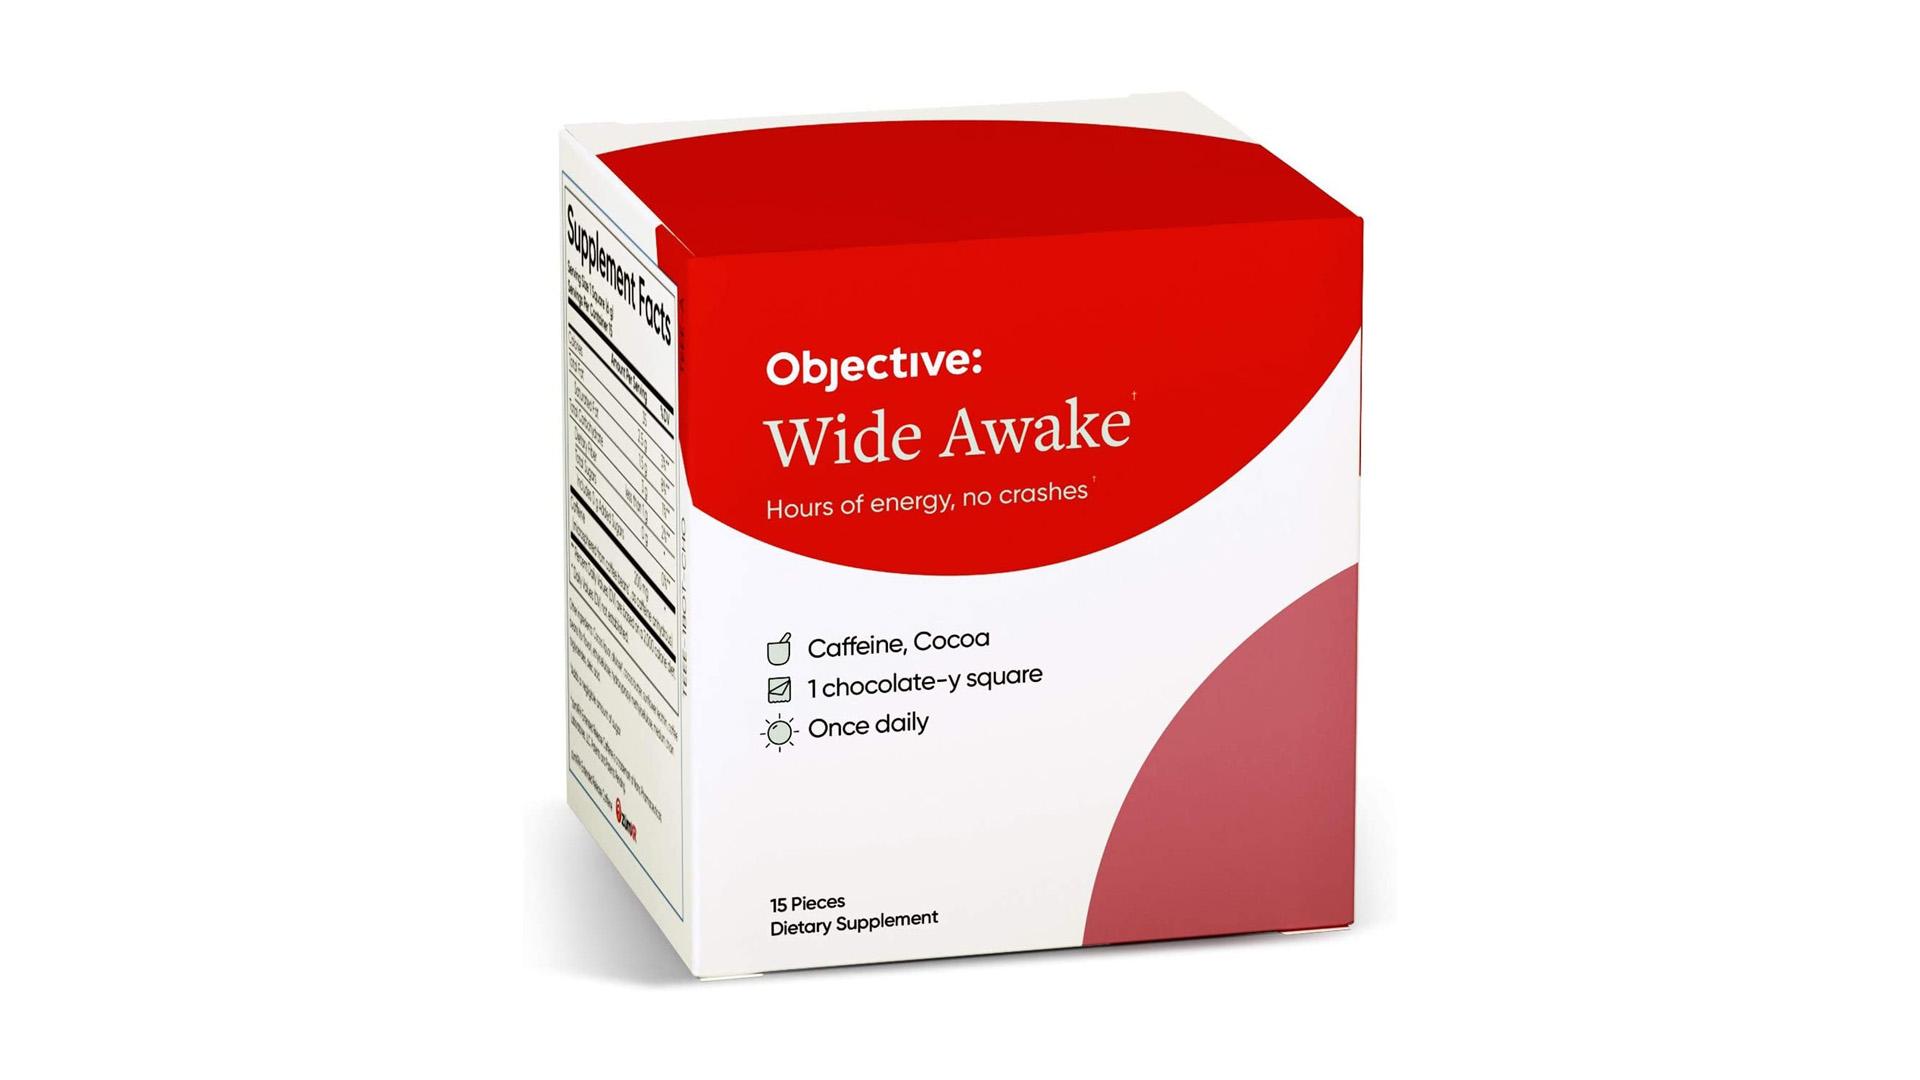 Objective Wide Awake